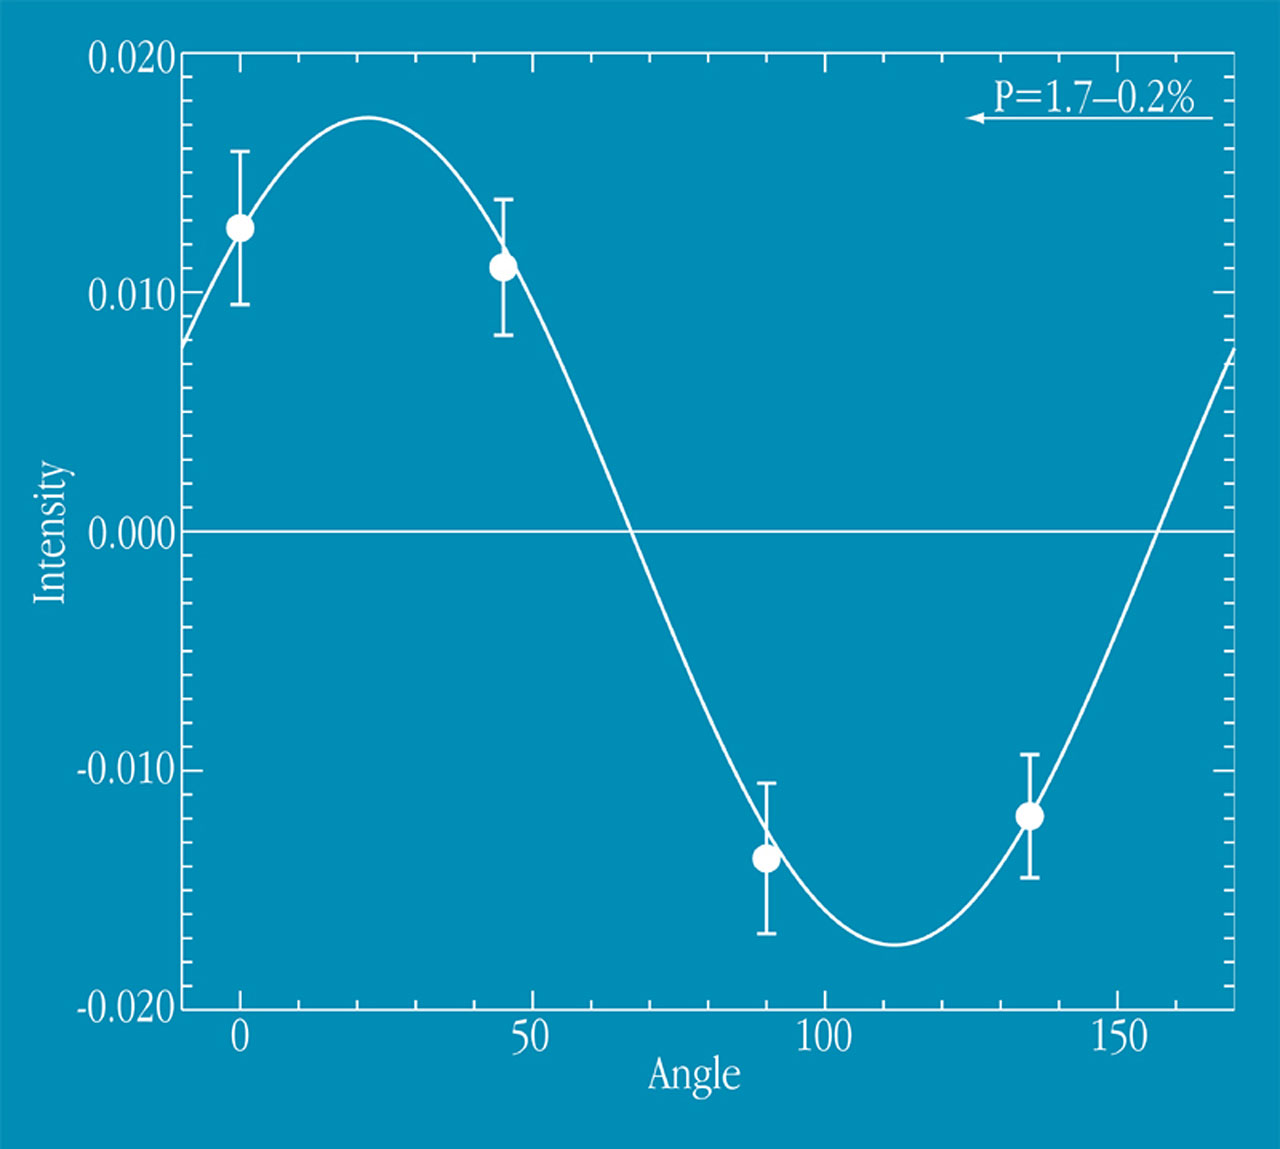 Polarization in GRB 990510